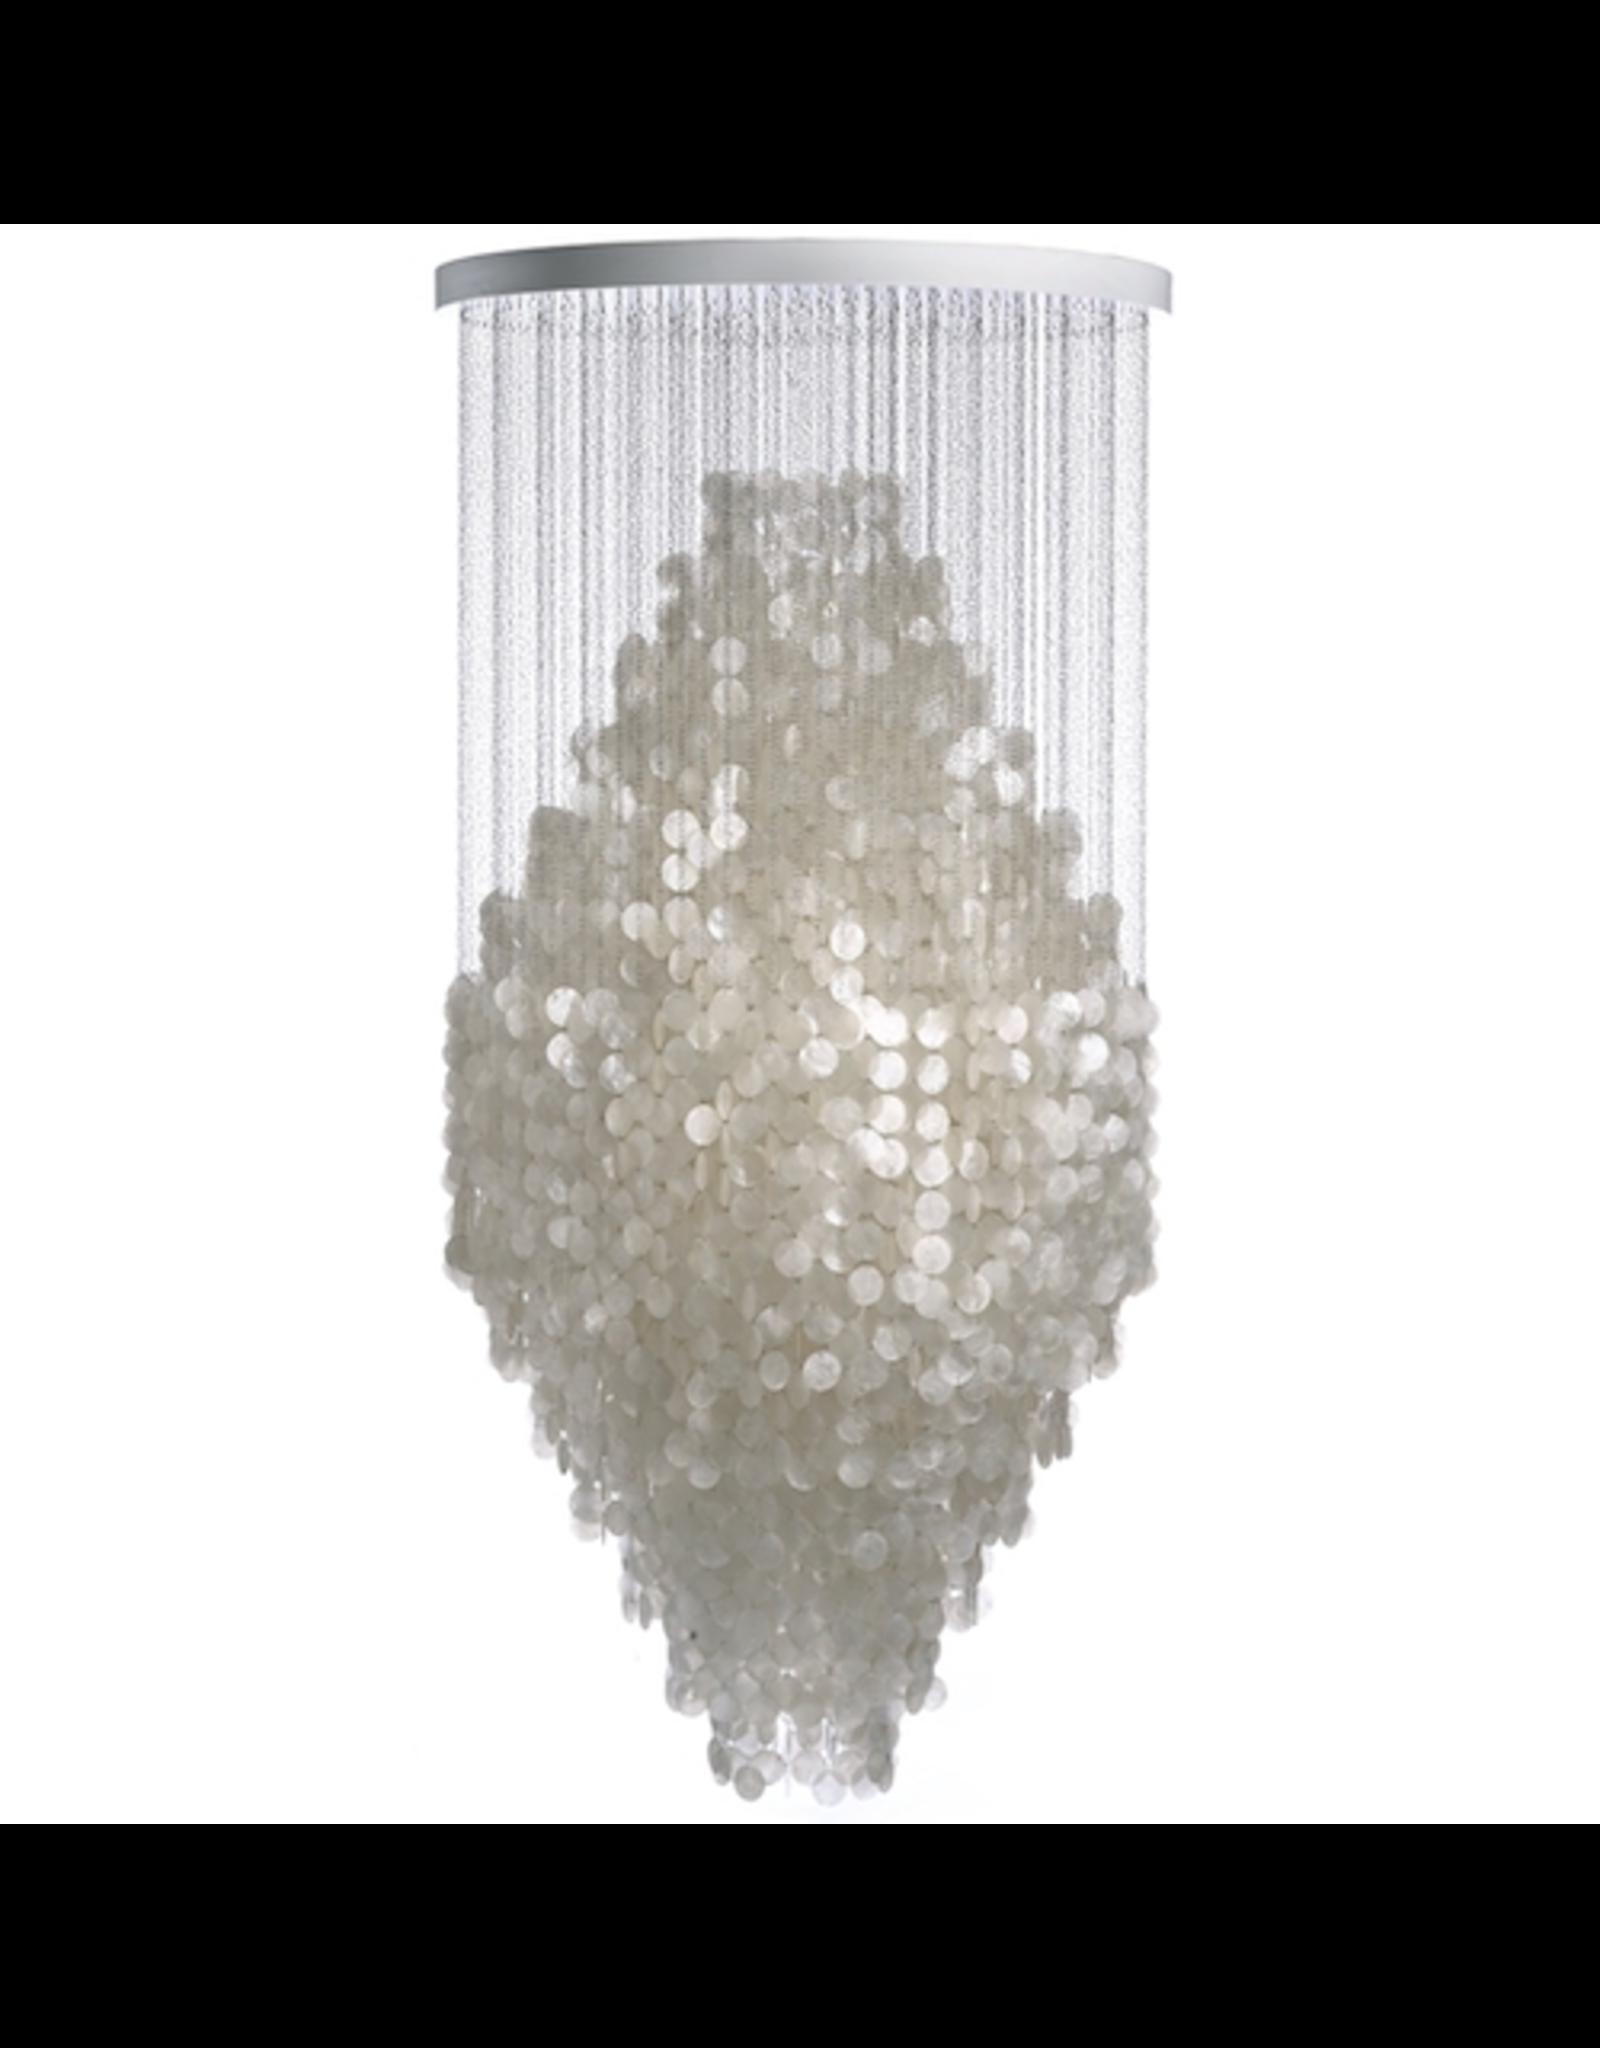 FUN 8DM PENDANT LAMP